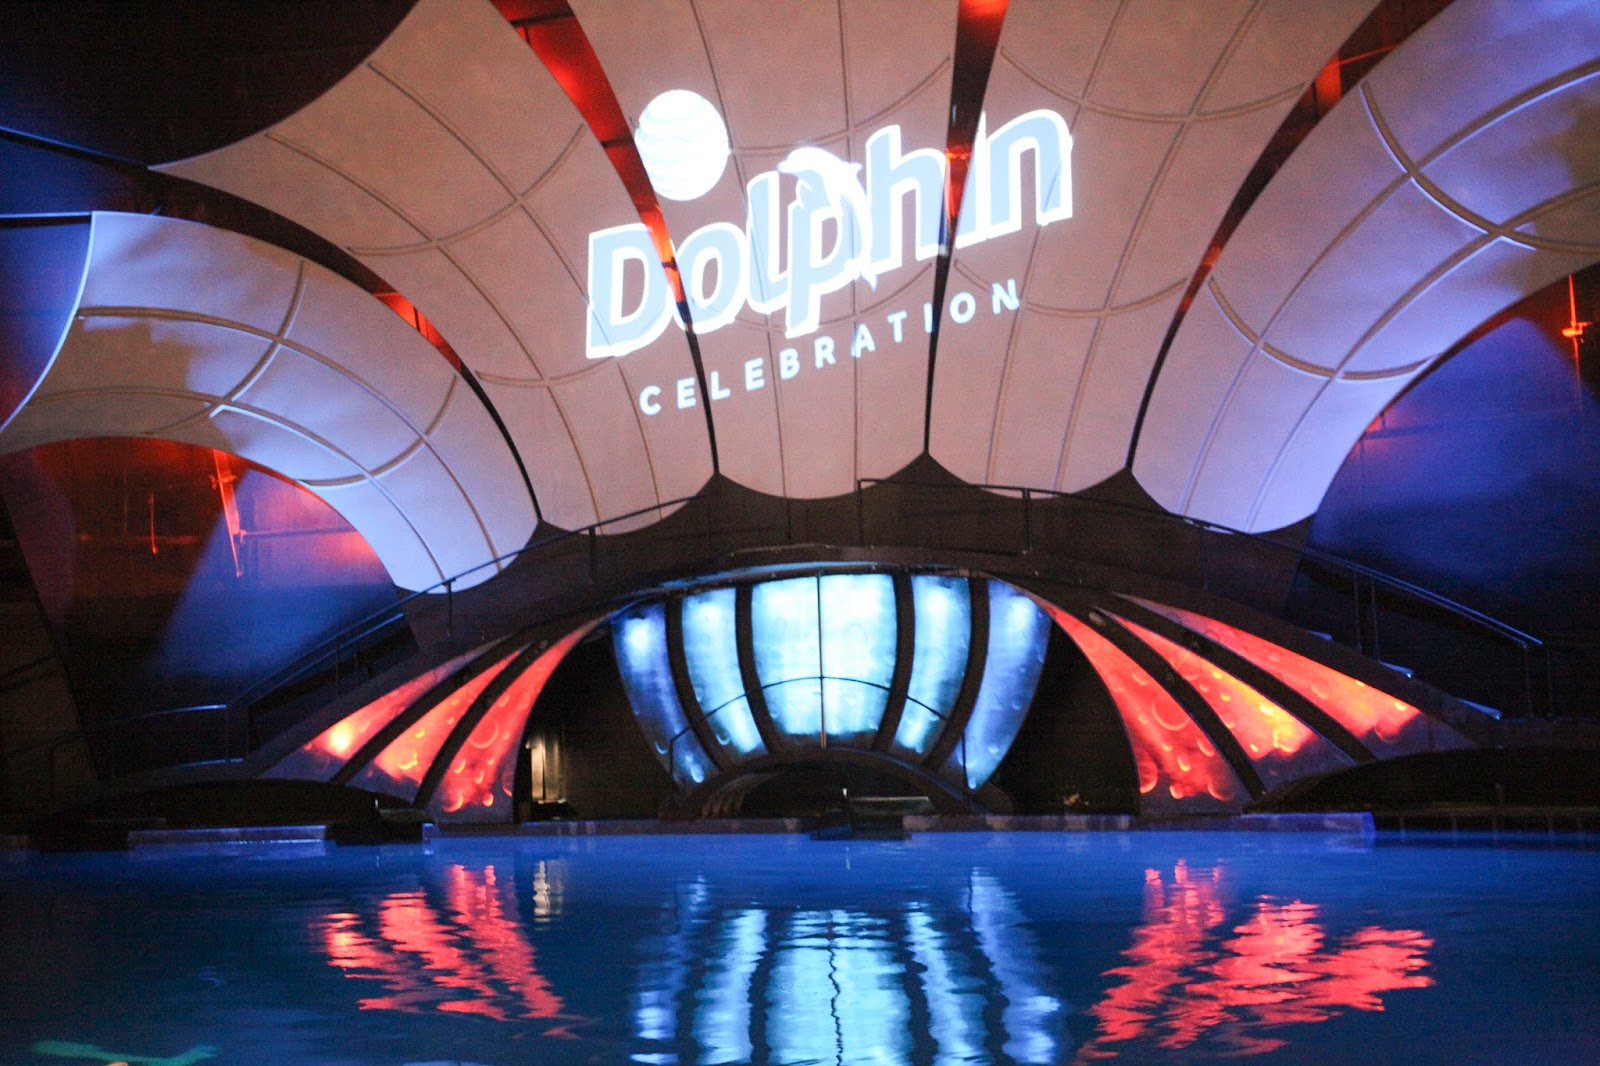 The Dolphin Show theater for the Georgia Aquarium